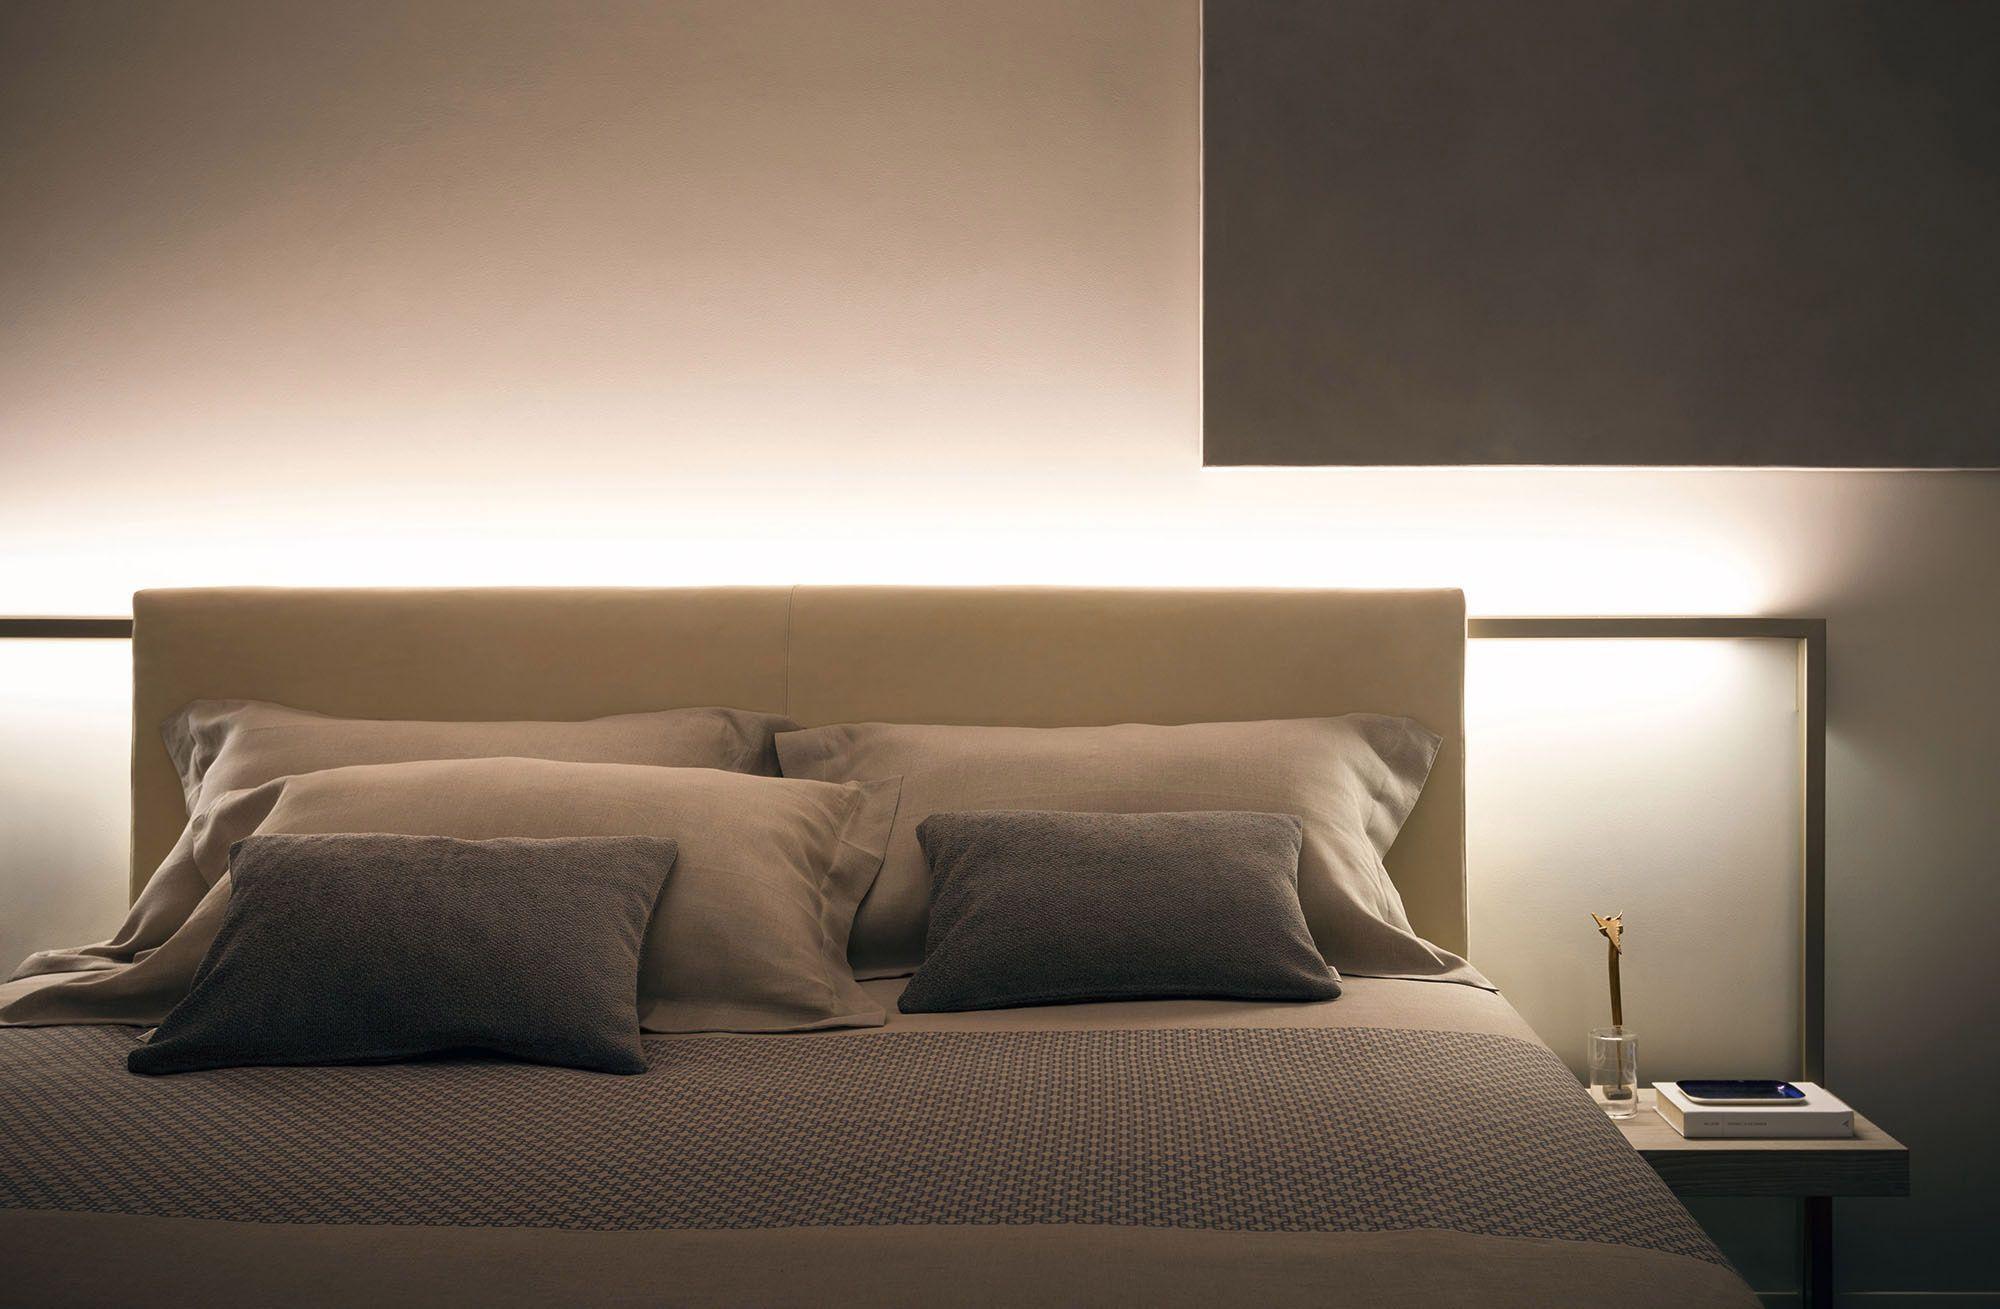 Natevo NUNZIATI Headboards for beds, Bed, Home